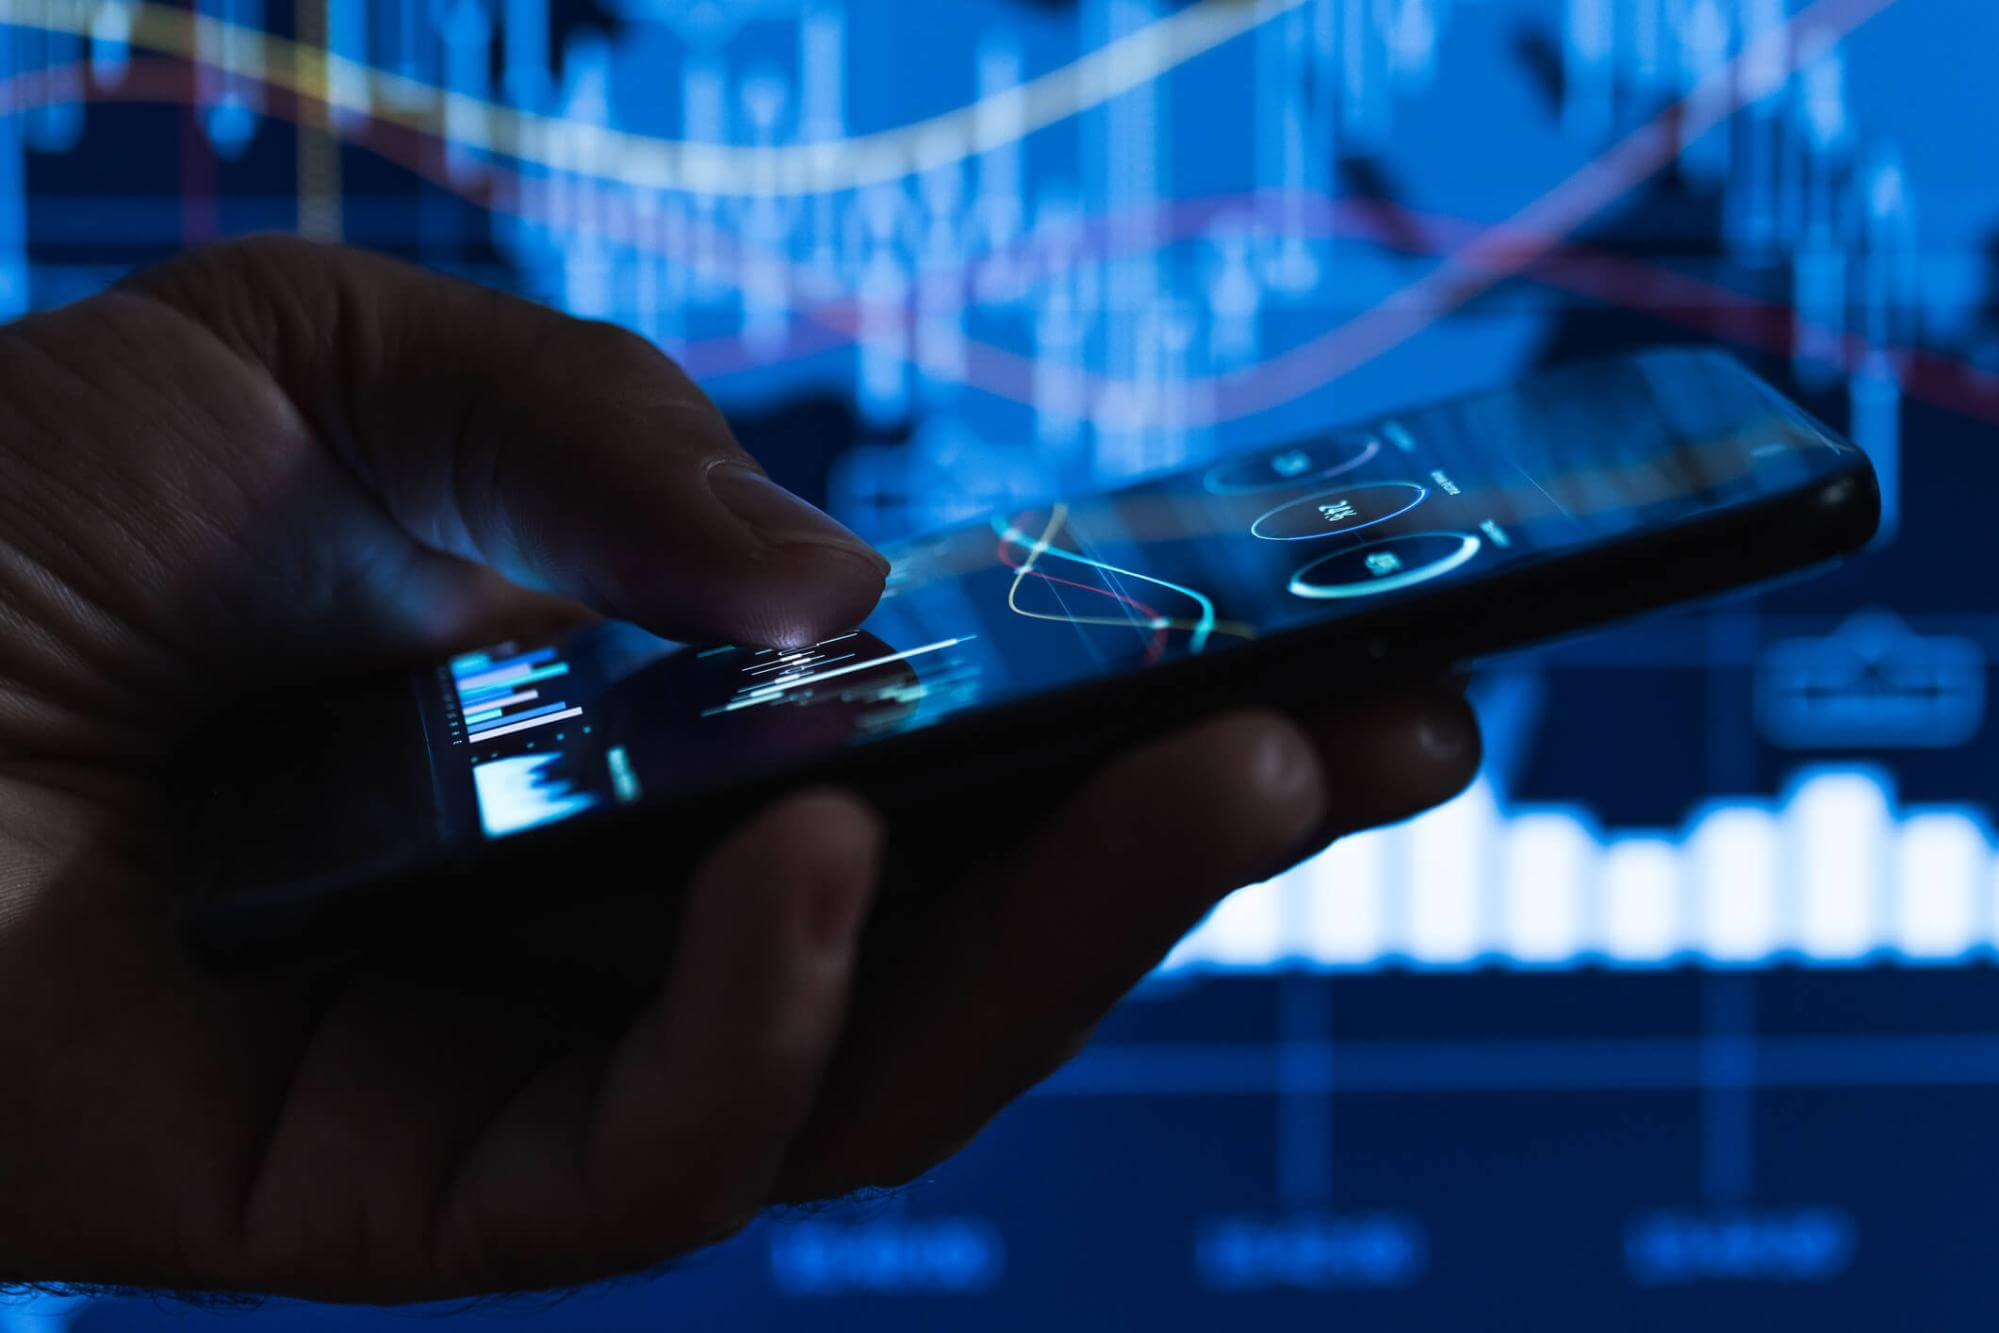 banco digital white label: conceito e como funciona?